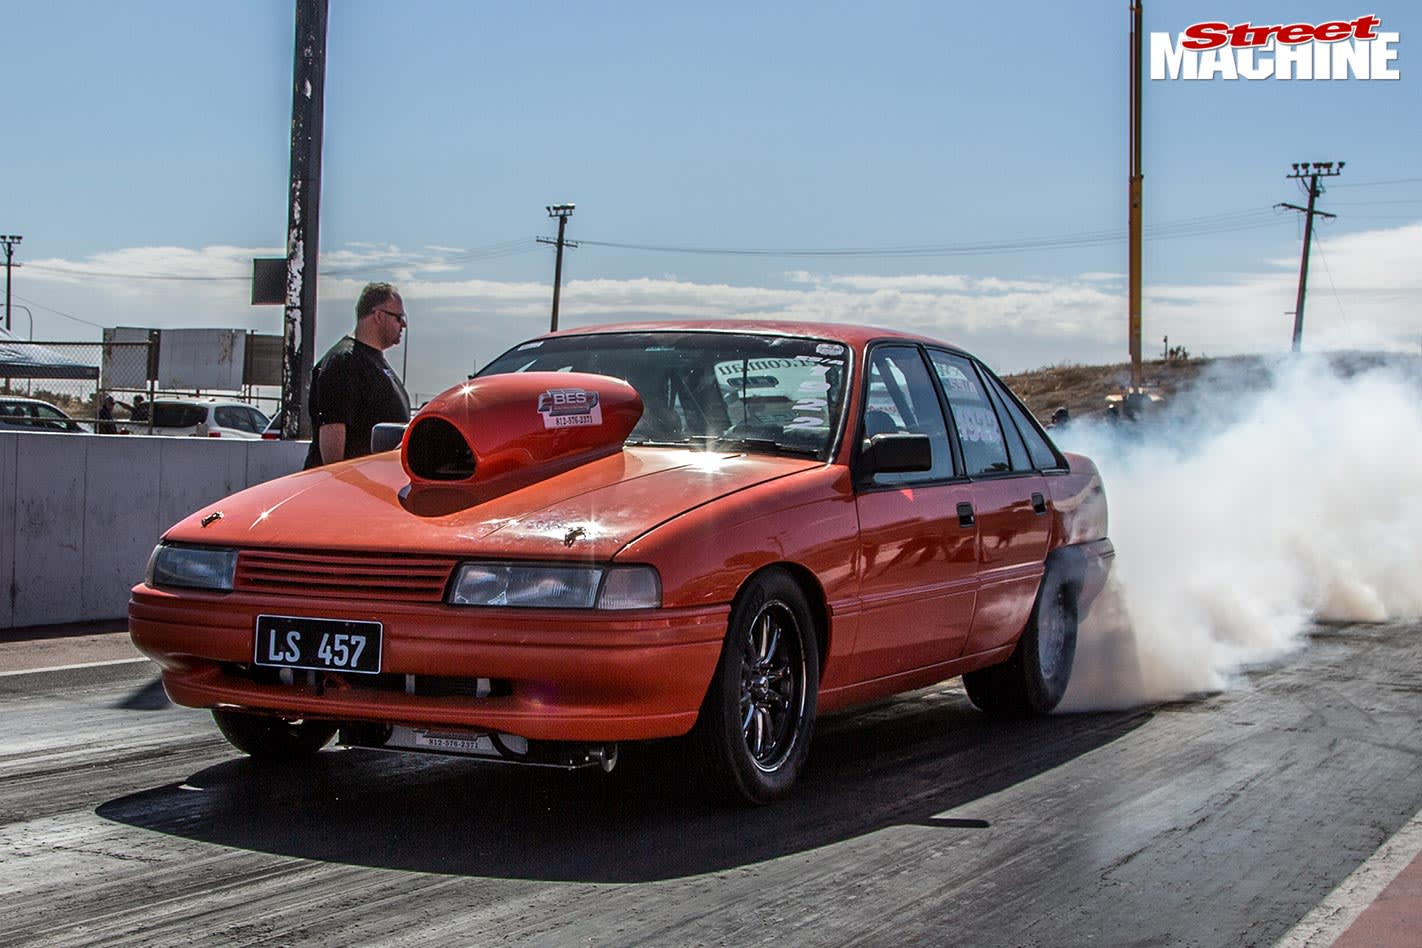 Holden VN Commodore drag